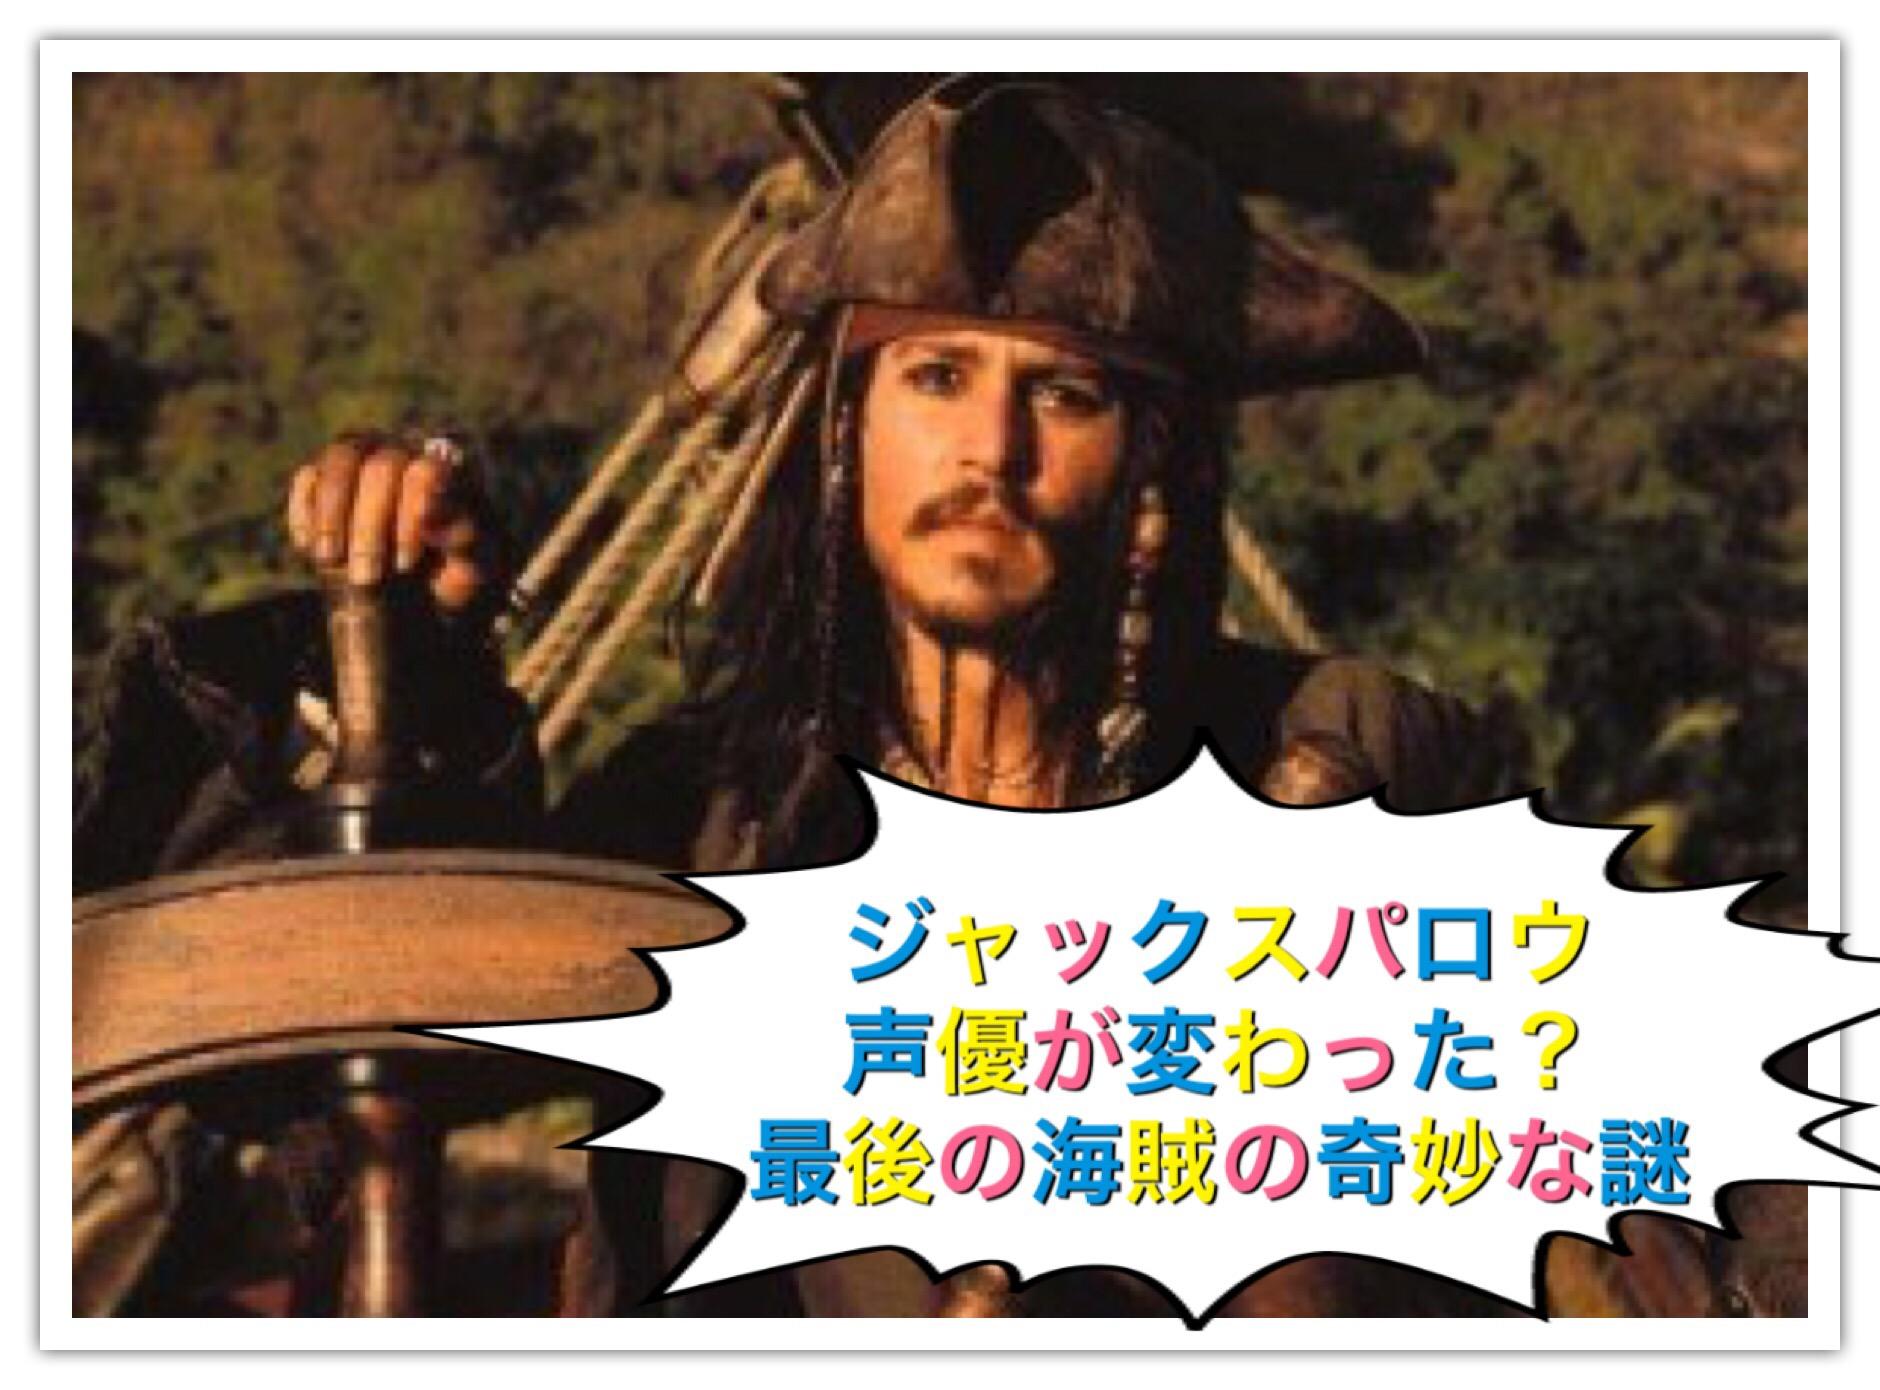 <b>⇨ジャックスパロウの声優が変わった?最後の海賊に異変が起きた謎</b>